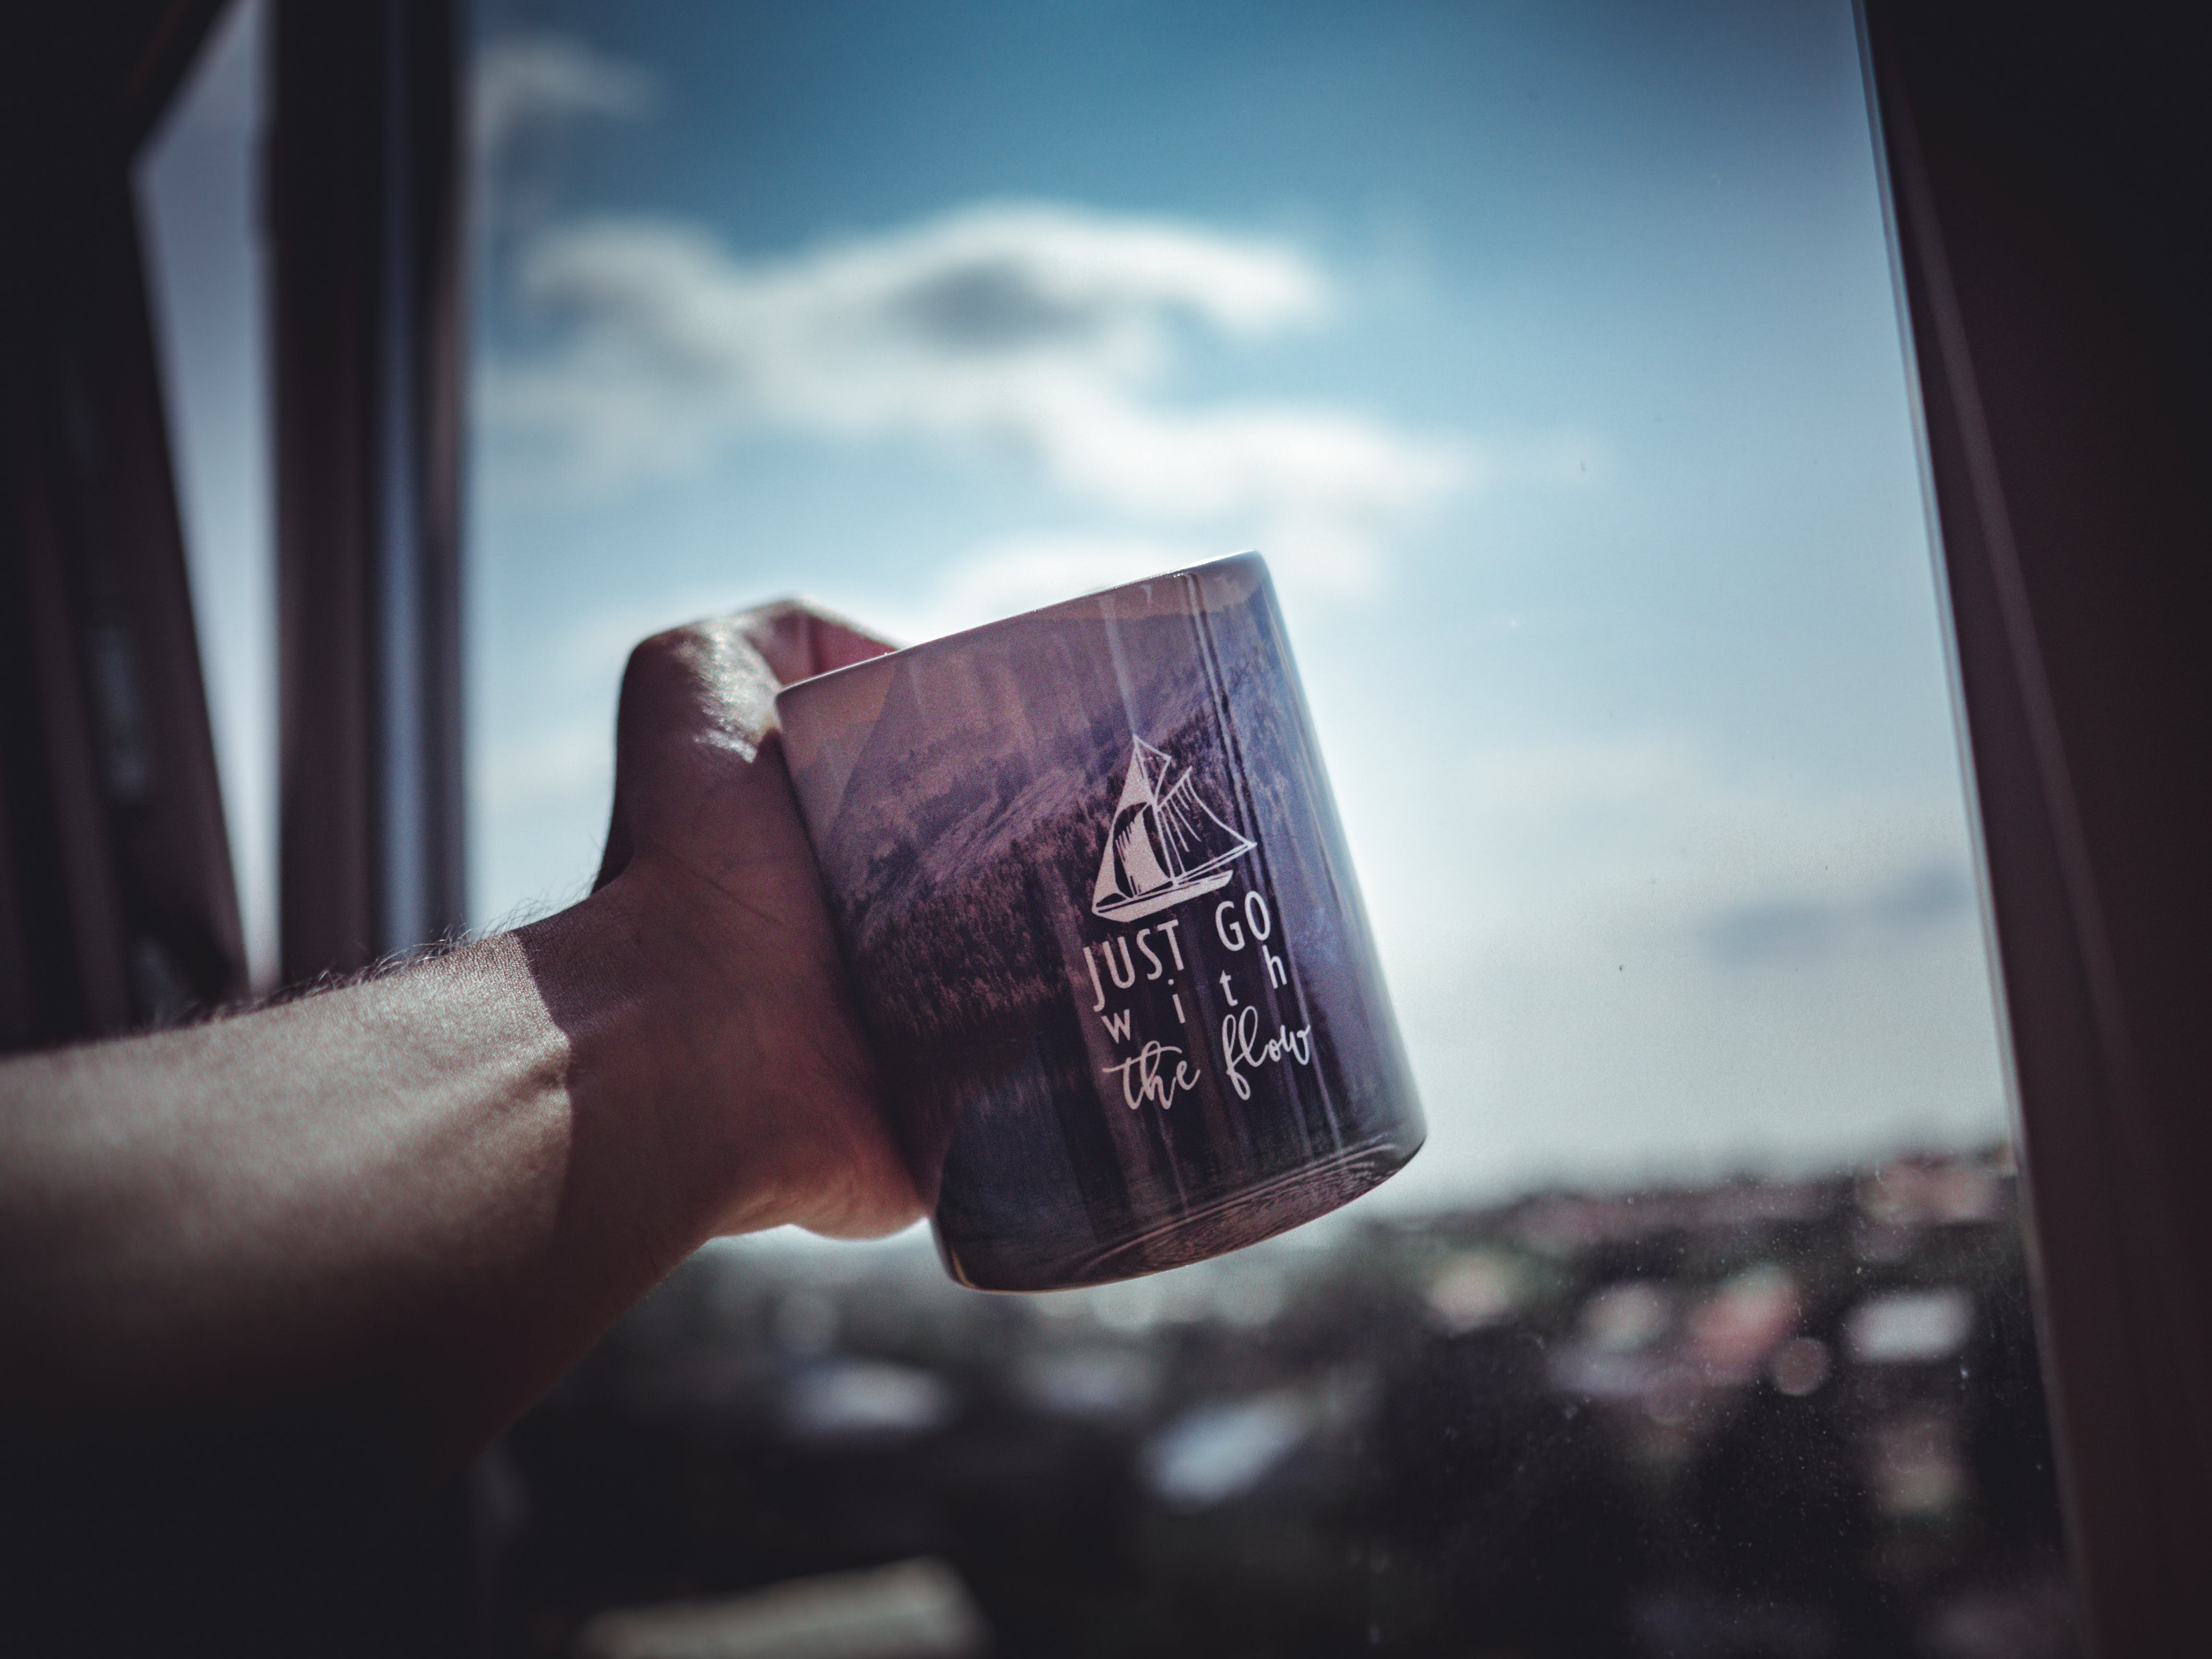 Person Holding Ceramic Mug